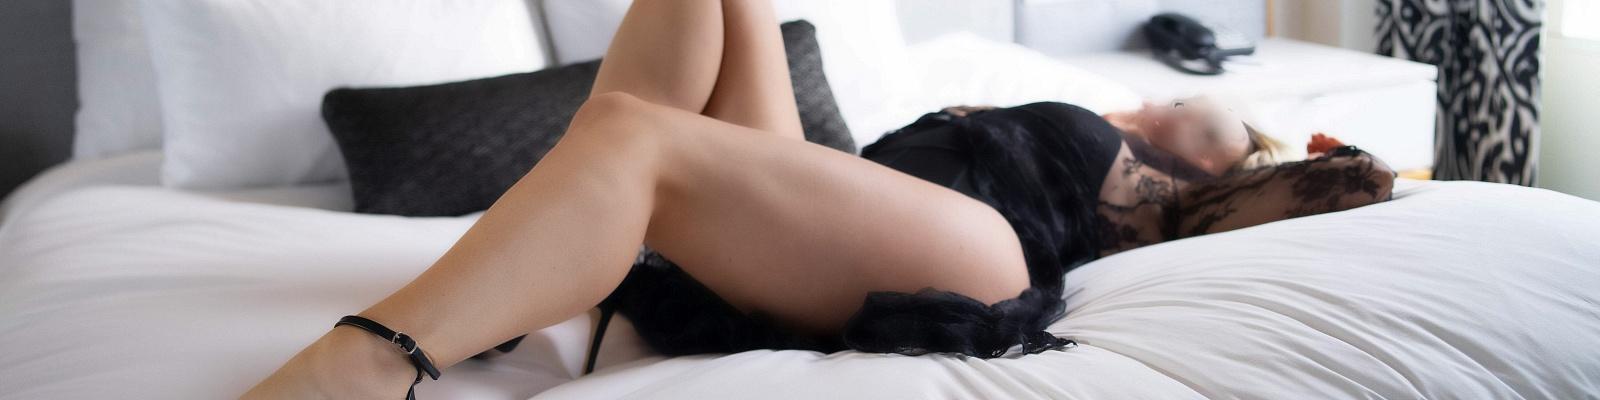 Sofia Sweet Escort